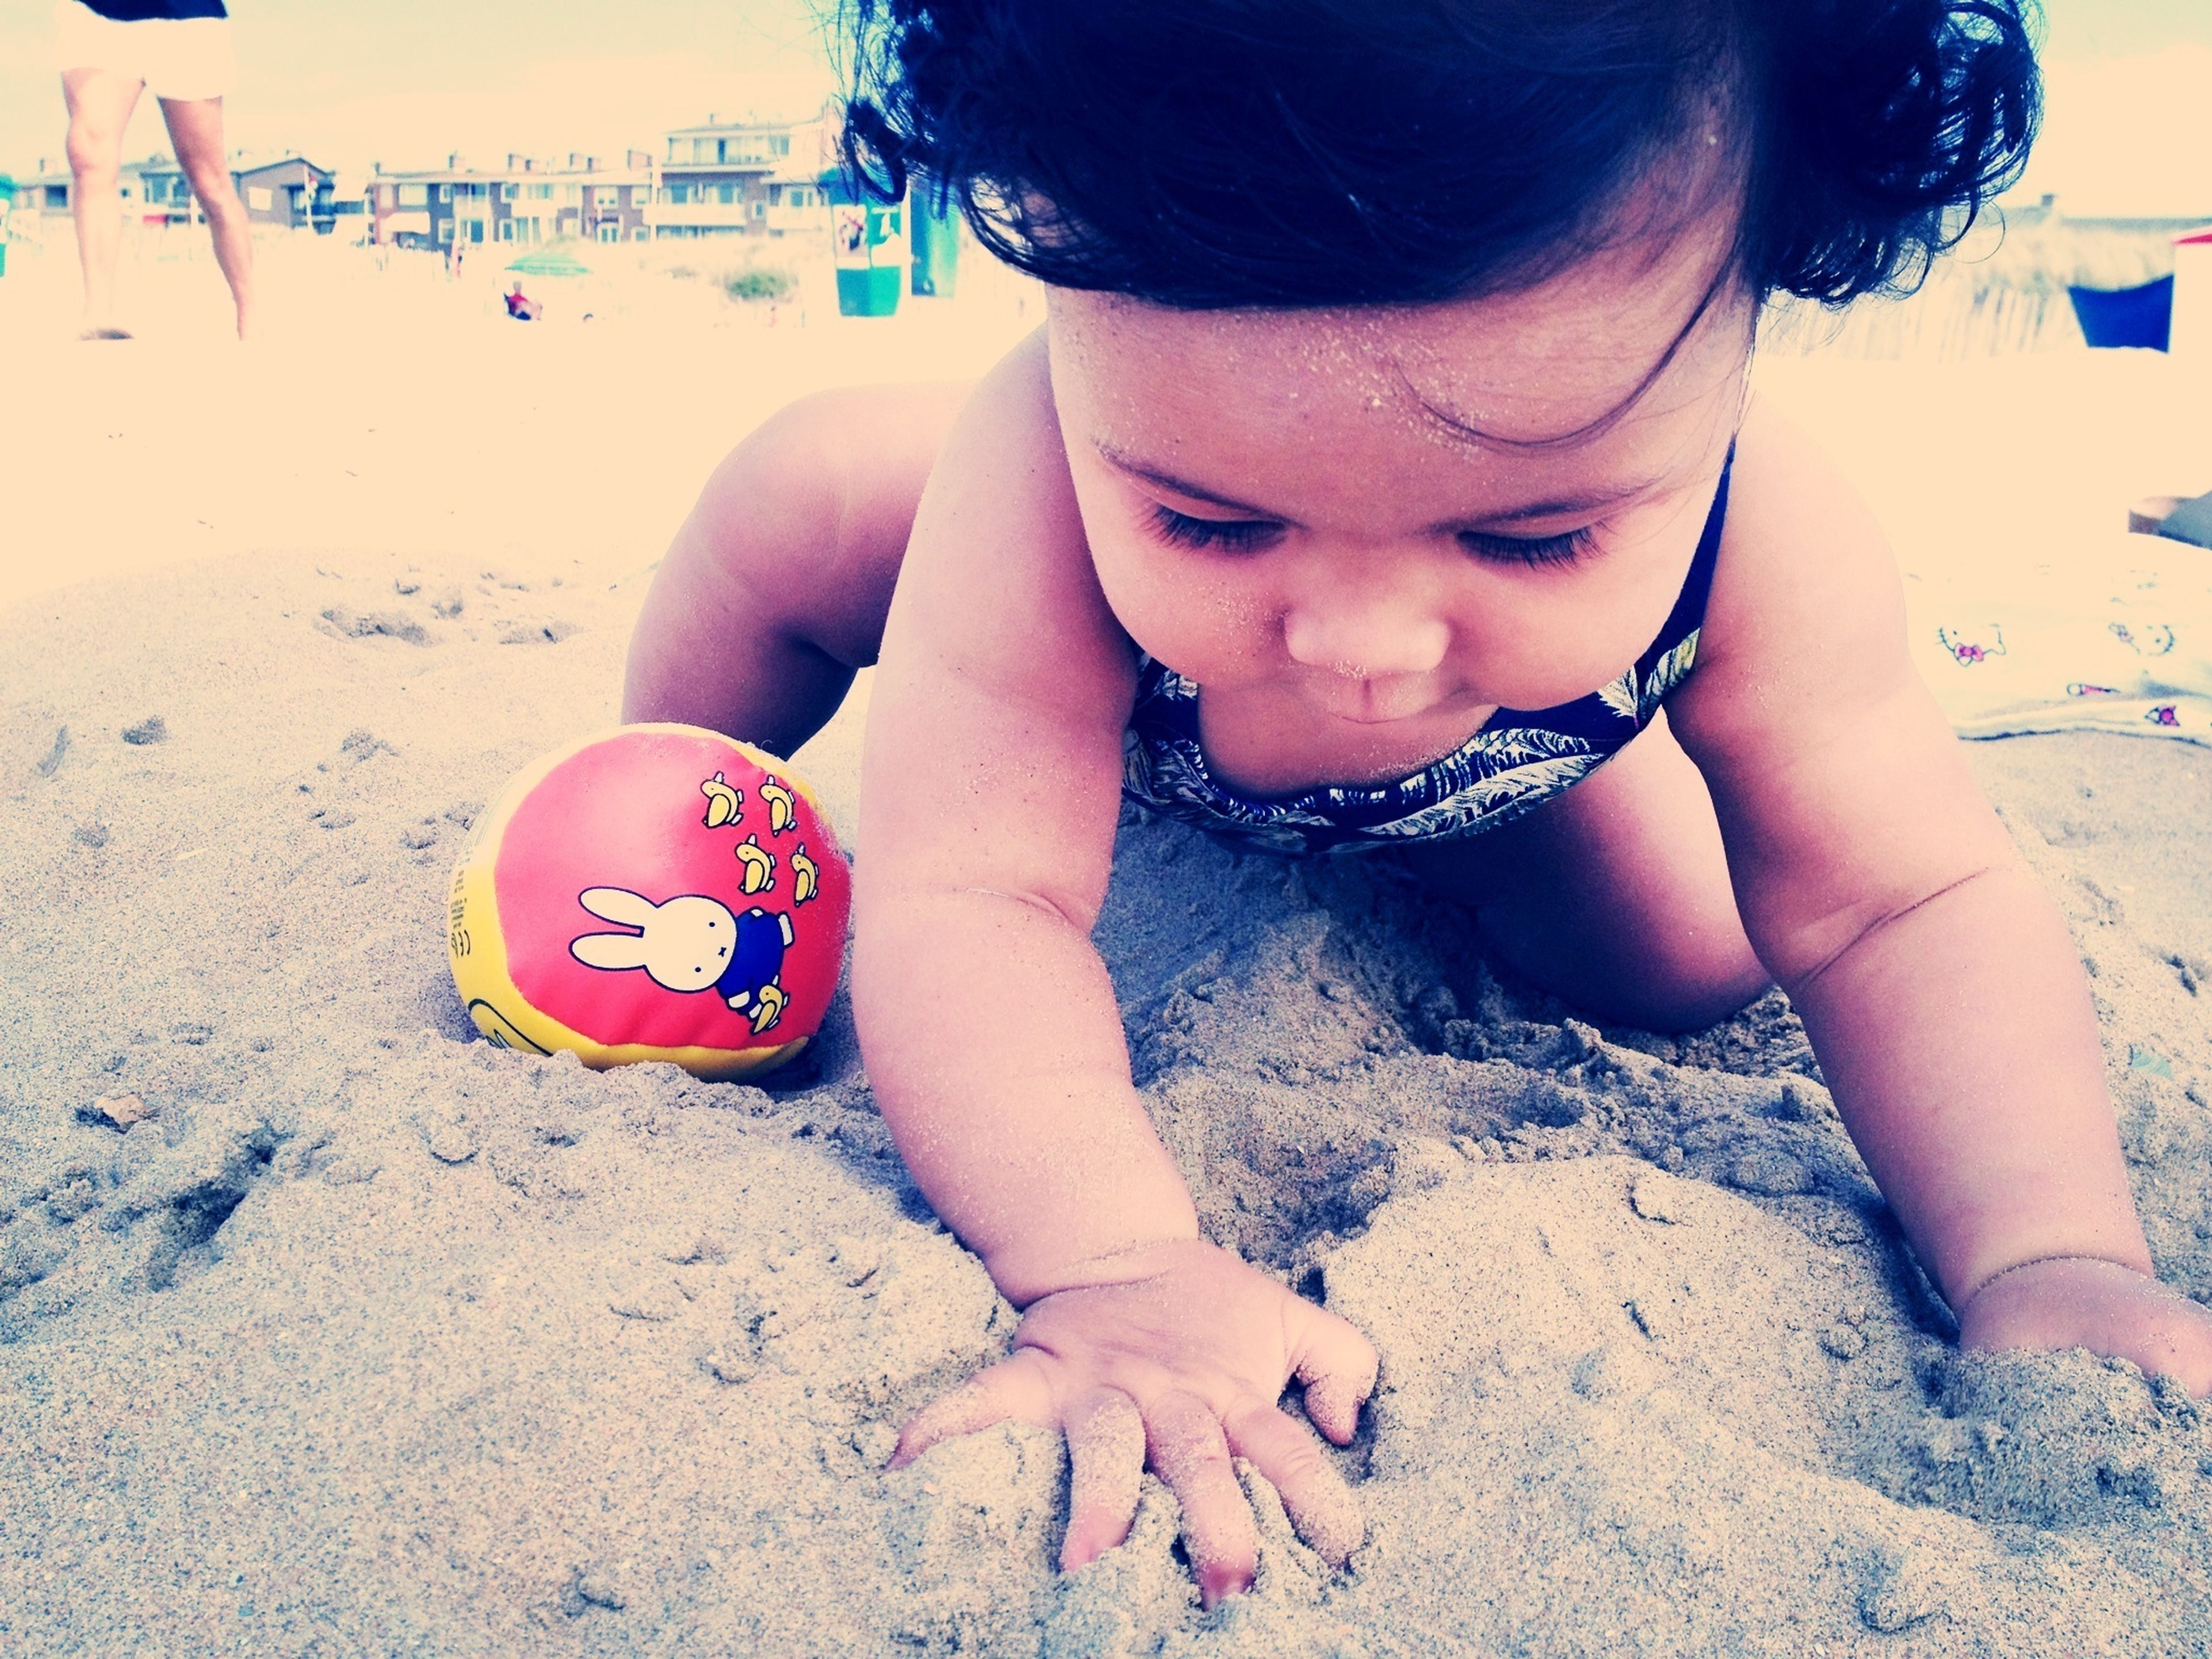 childhood, elementary age, beach, sand, leisure activity, girls, lifestyles, innocence, boys, playful, person, playing, cute, fun, enjoyment, happiness, portrait, shore